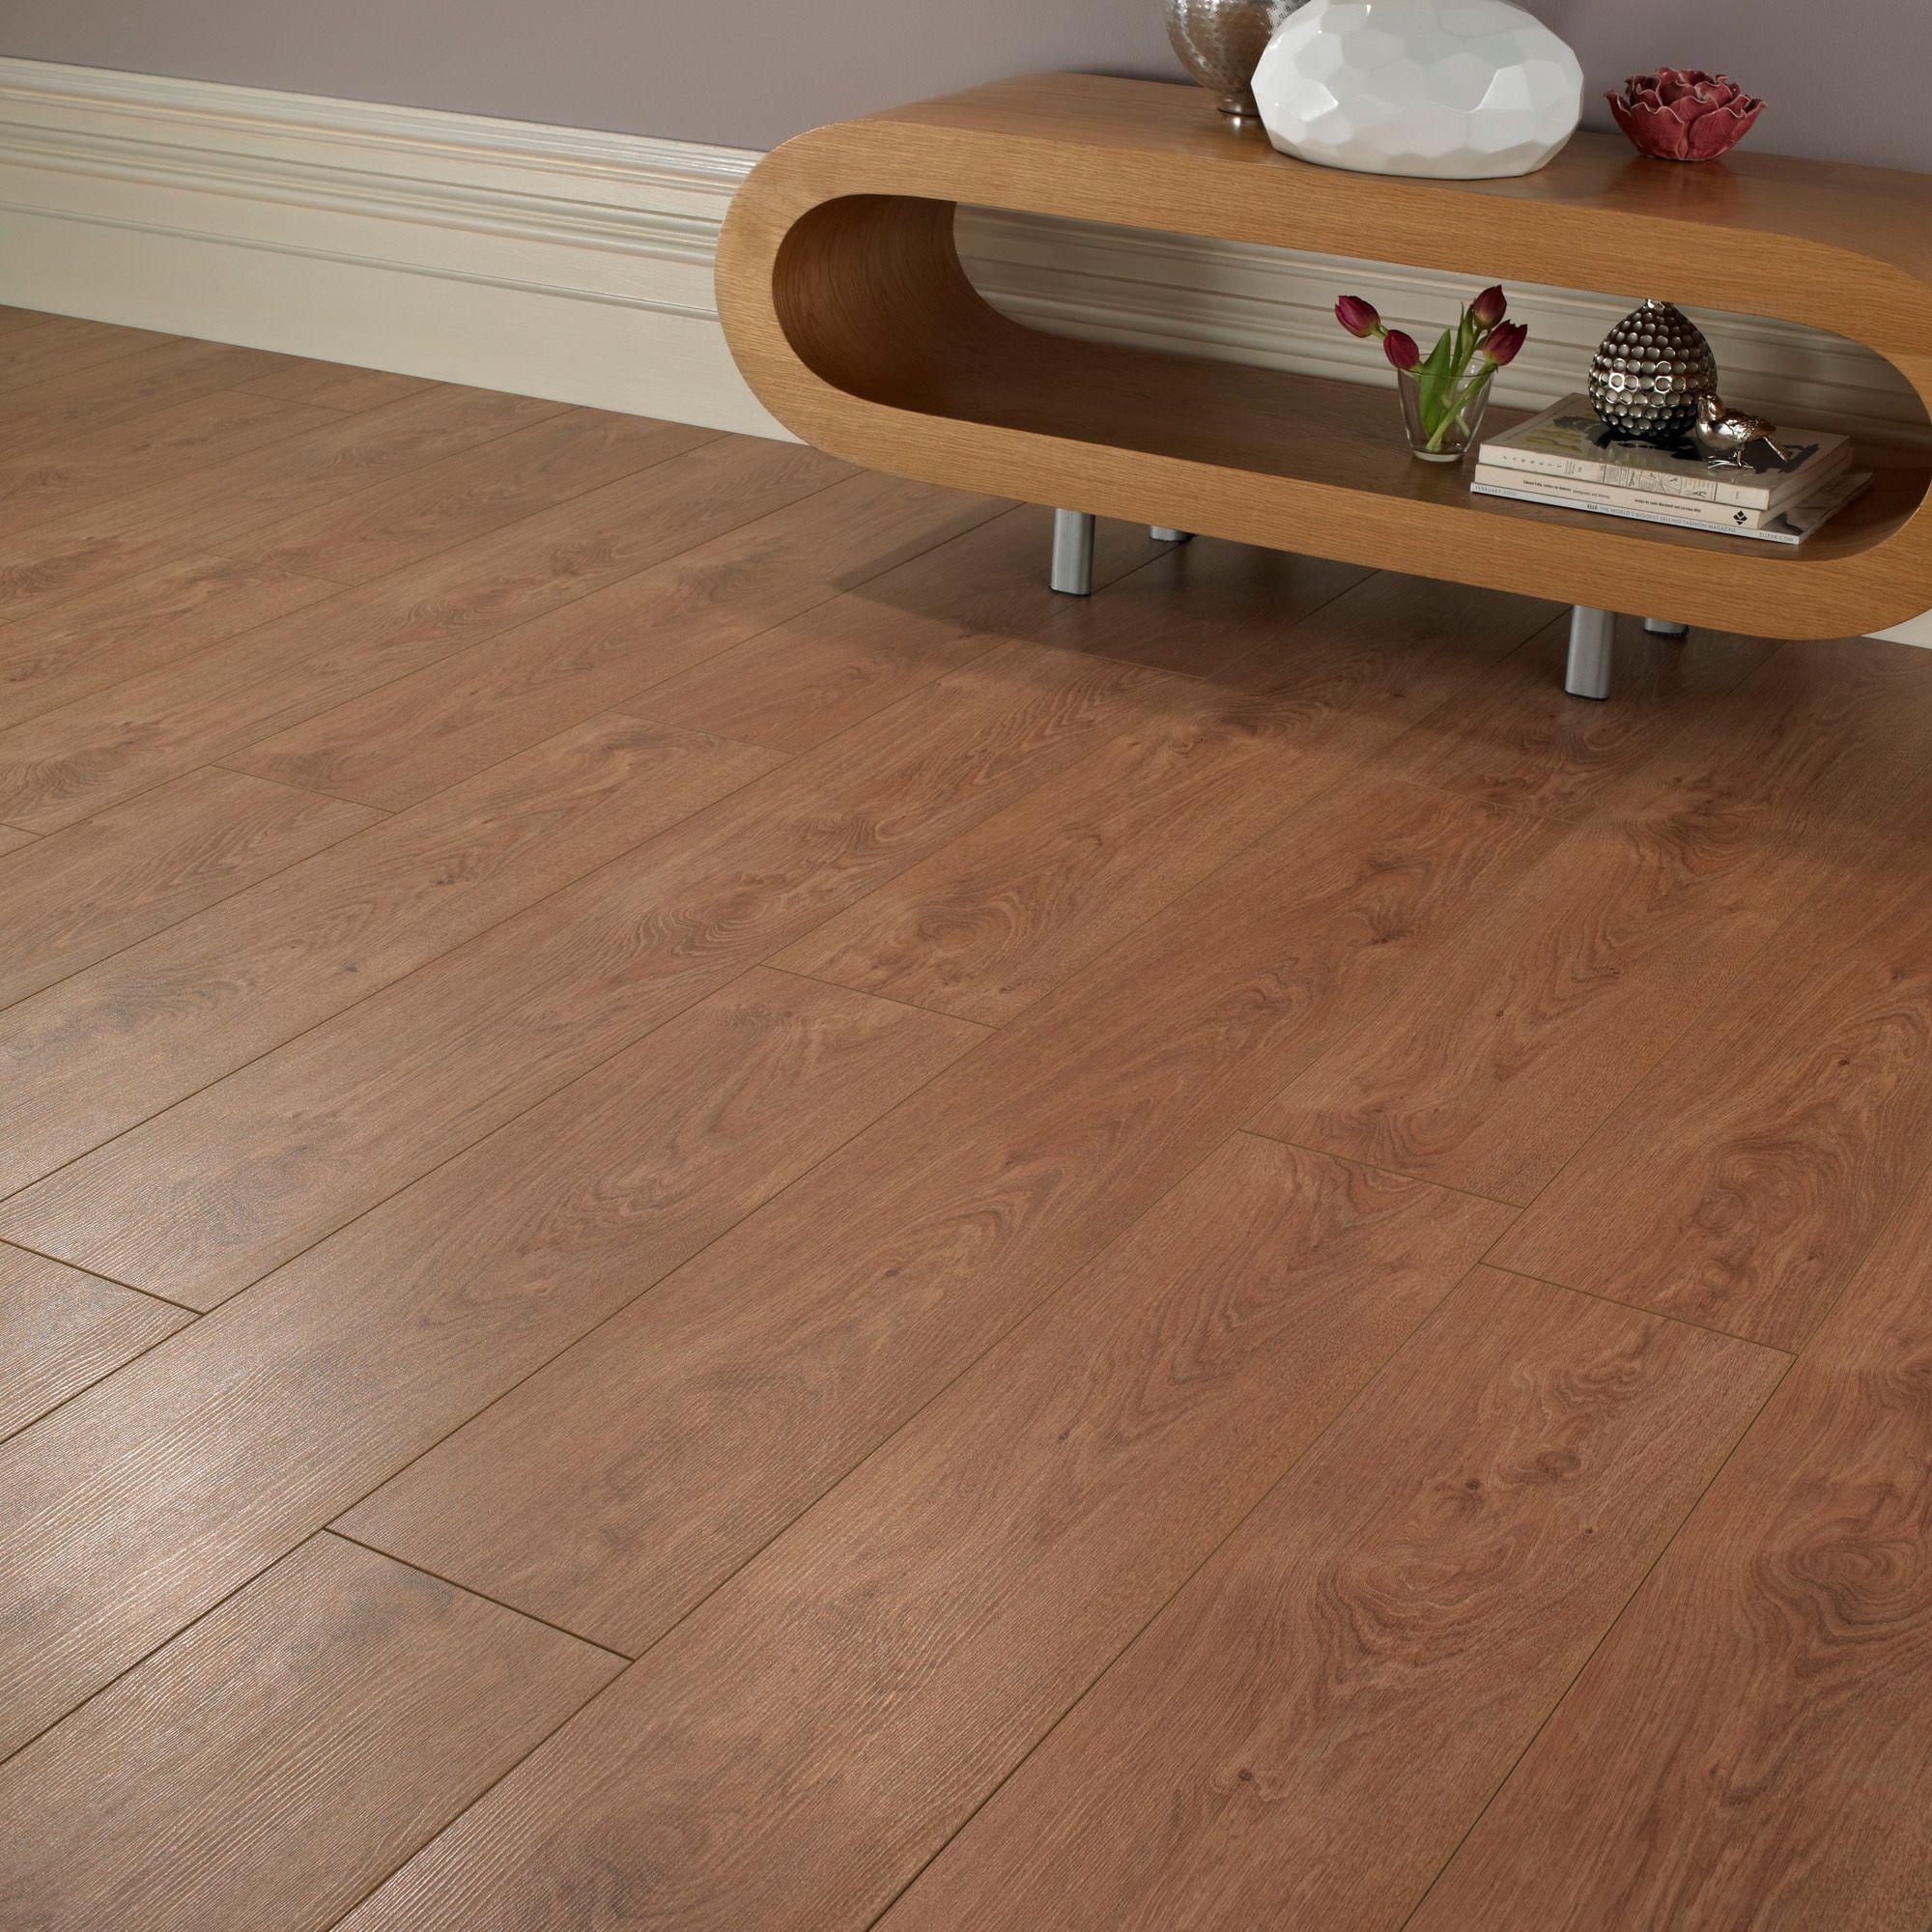 Colours Bandura Bologna Oak Effect Laminate Flooring 2 25 M² Departments Diy At B Q